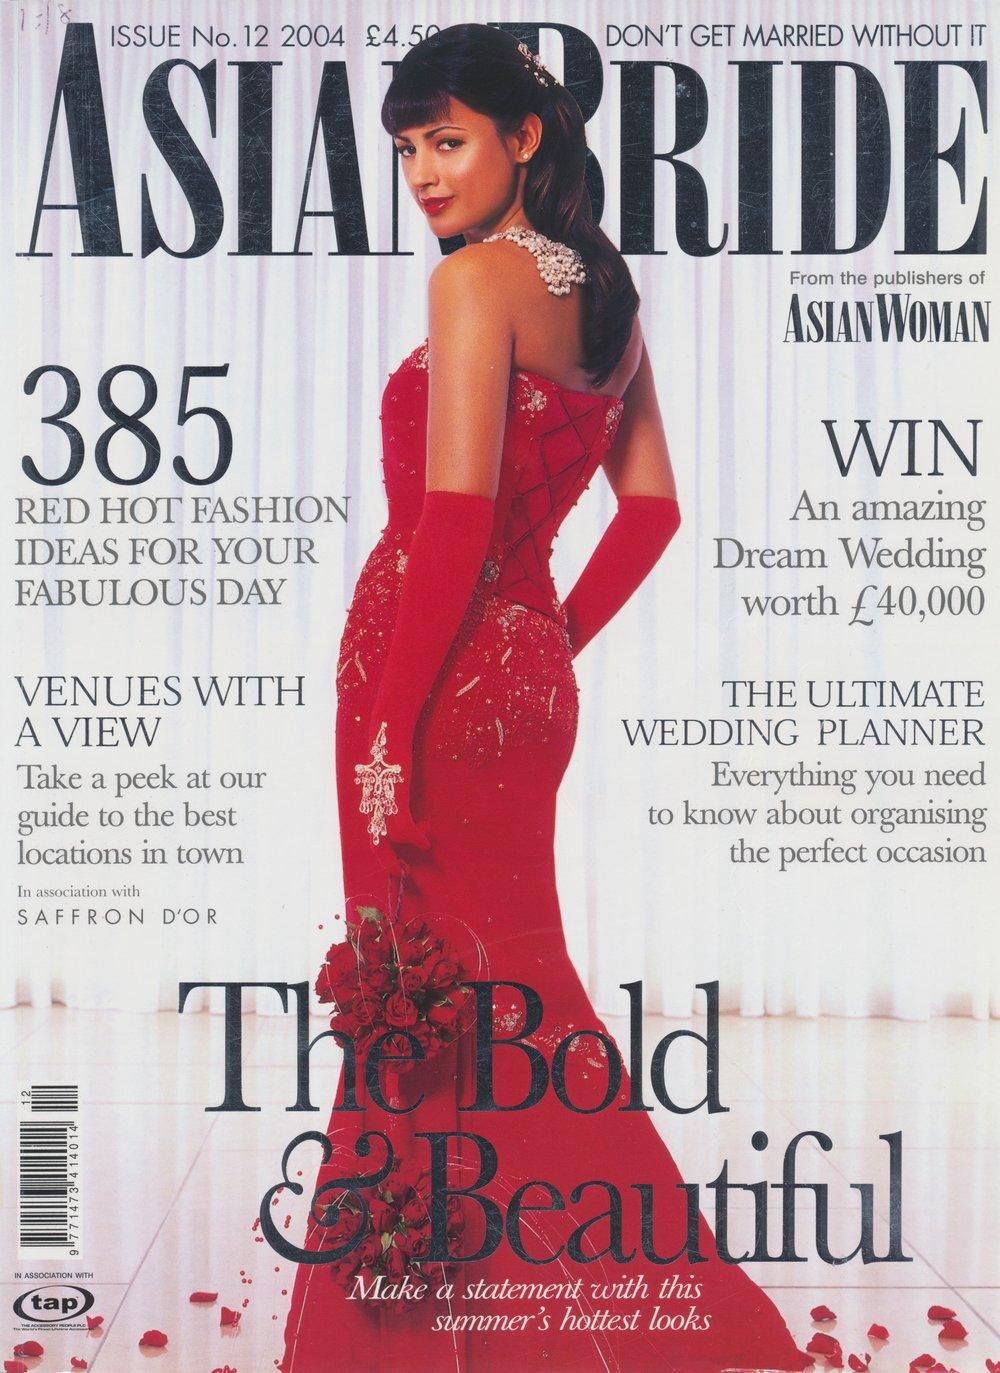 aruna_shields_asian_bride_magazine_cover.jpg